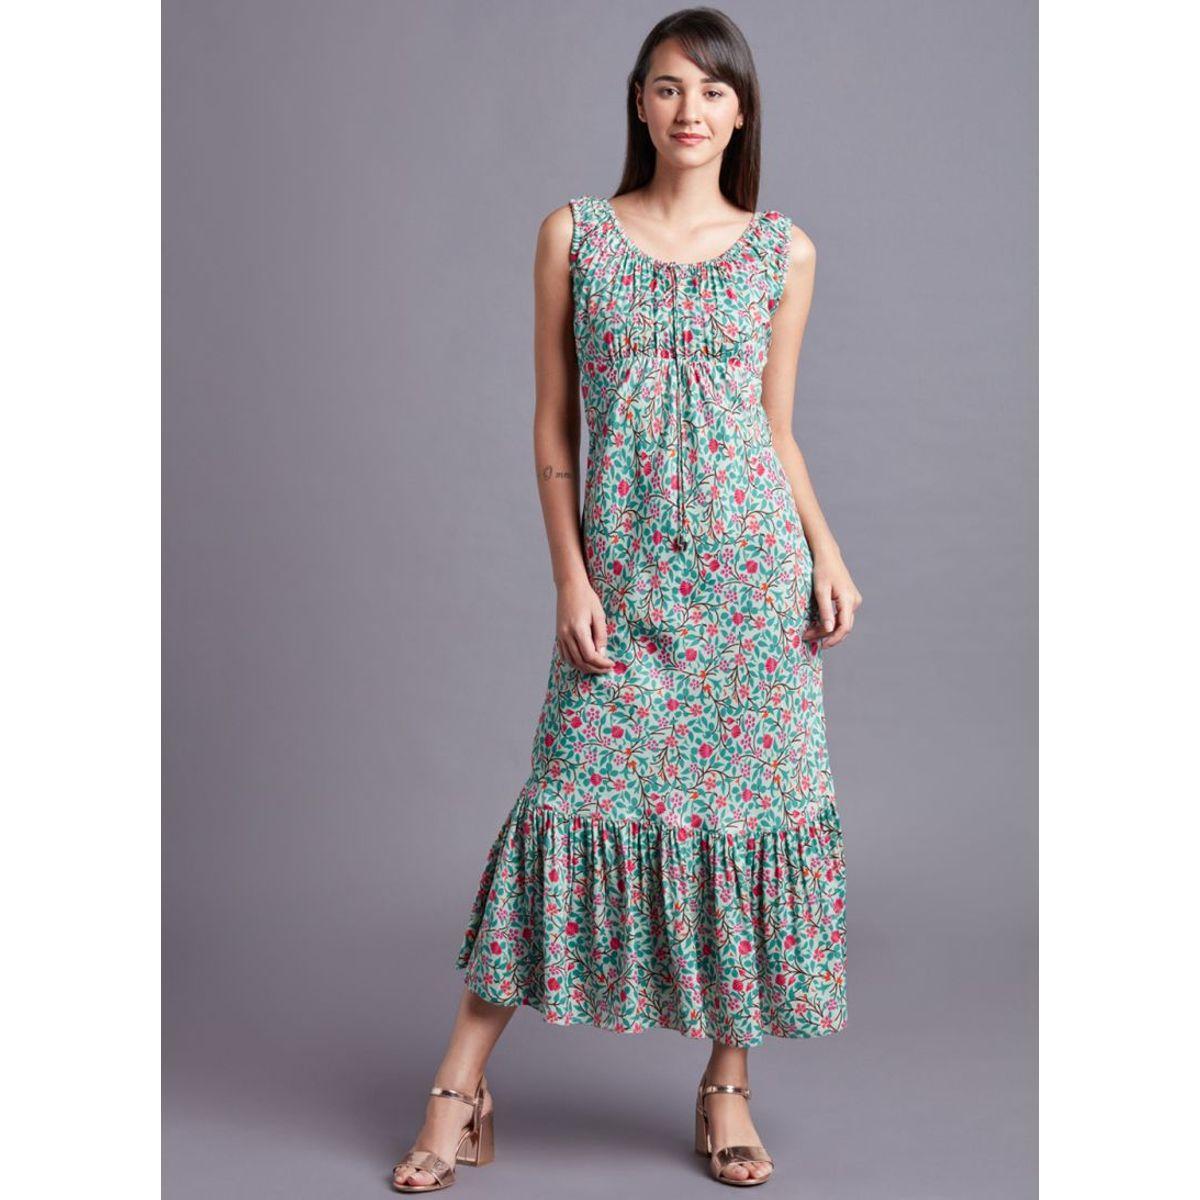 58e17b4b5b37fc Aqua Floral Sleeveless Dress